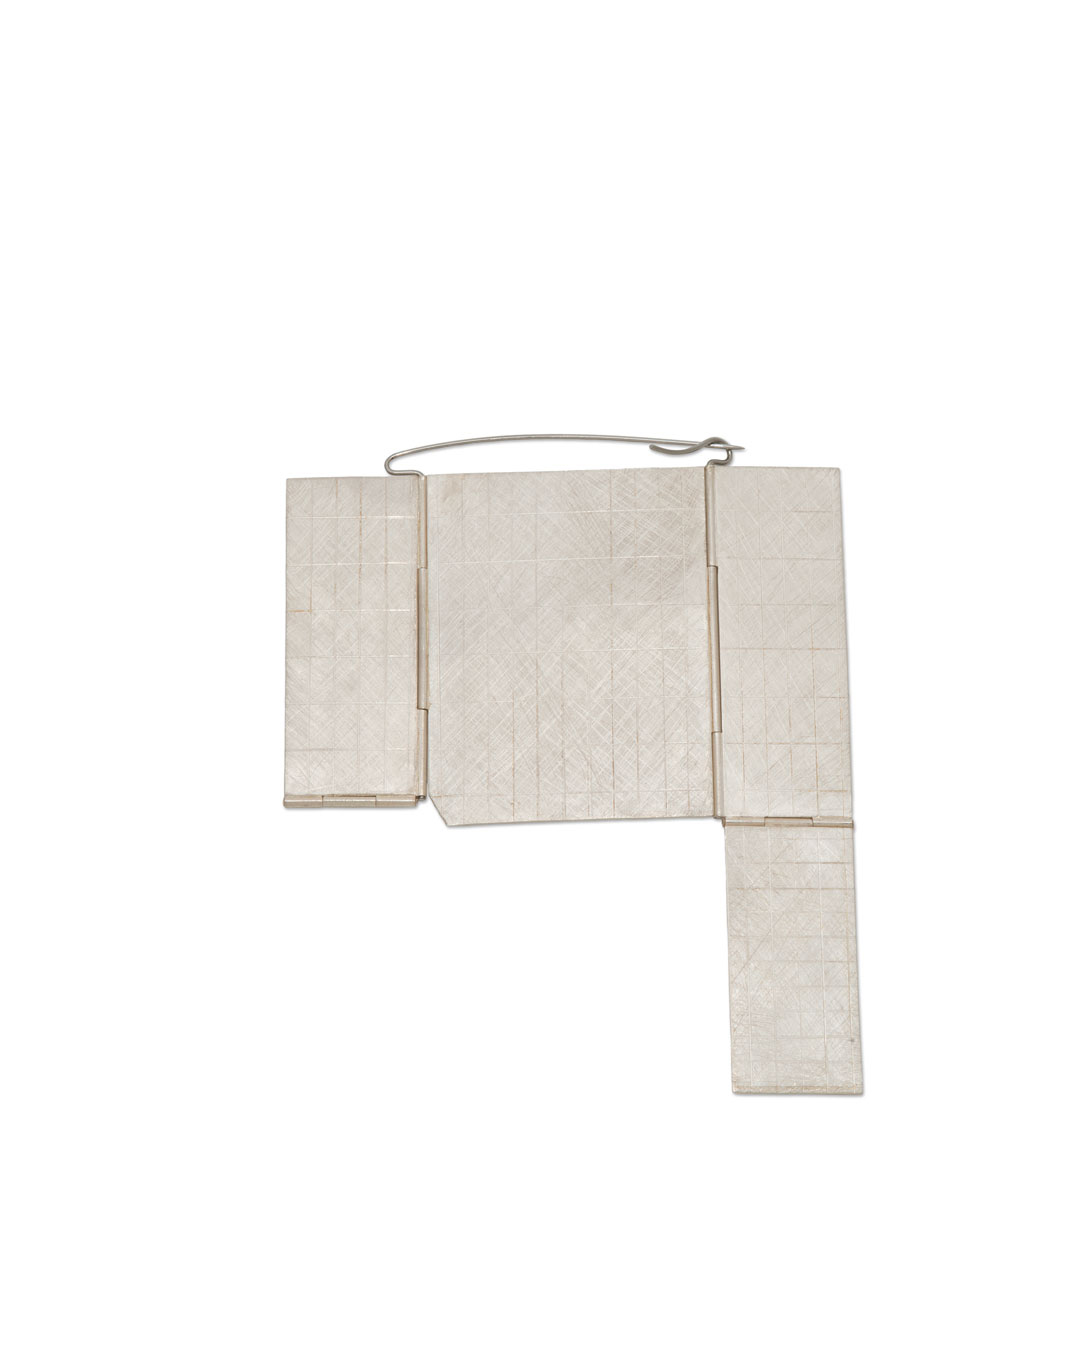 Noam Elyashiv, Box, 2017, brooch; reclaimed silver, steel, 81 x 72 x 0,8 mm, €1560